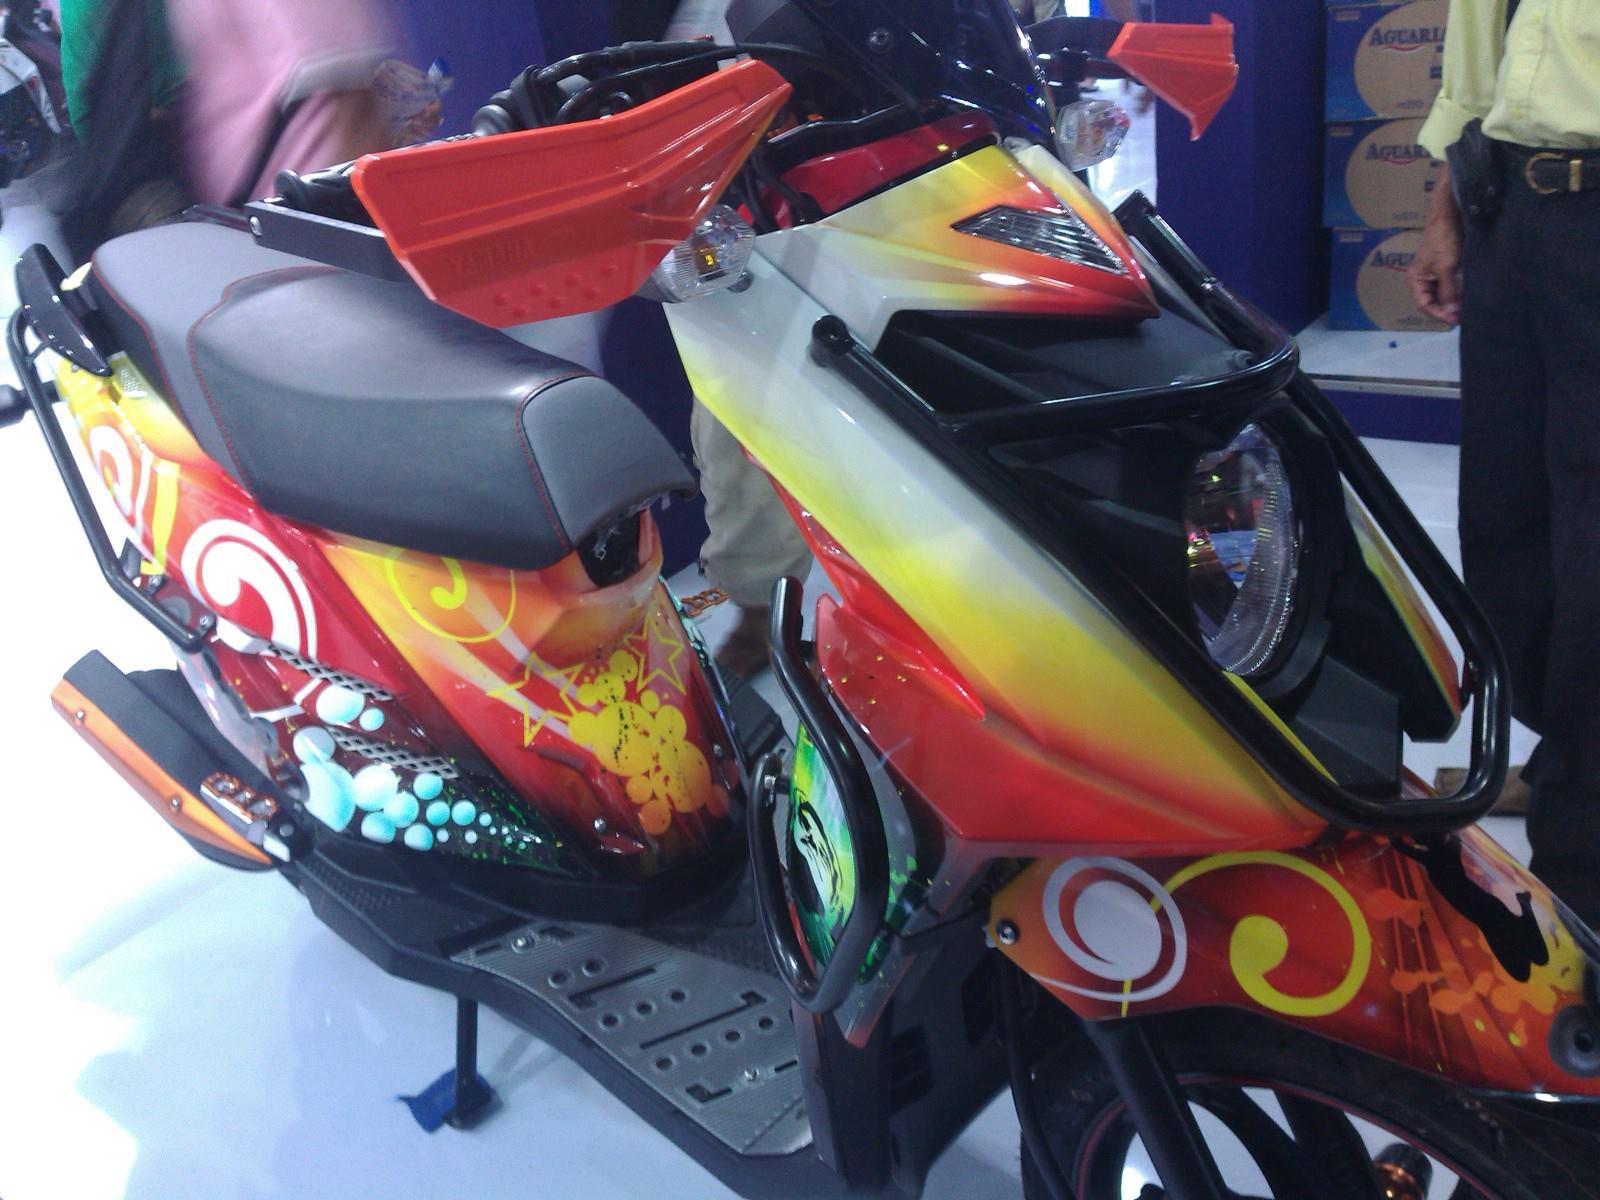 Ide 81 Modifikasi Motor Matic Yamaha X Ride Terupdate Dinding Motor